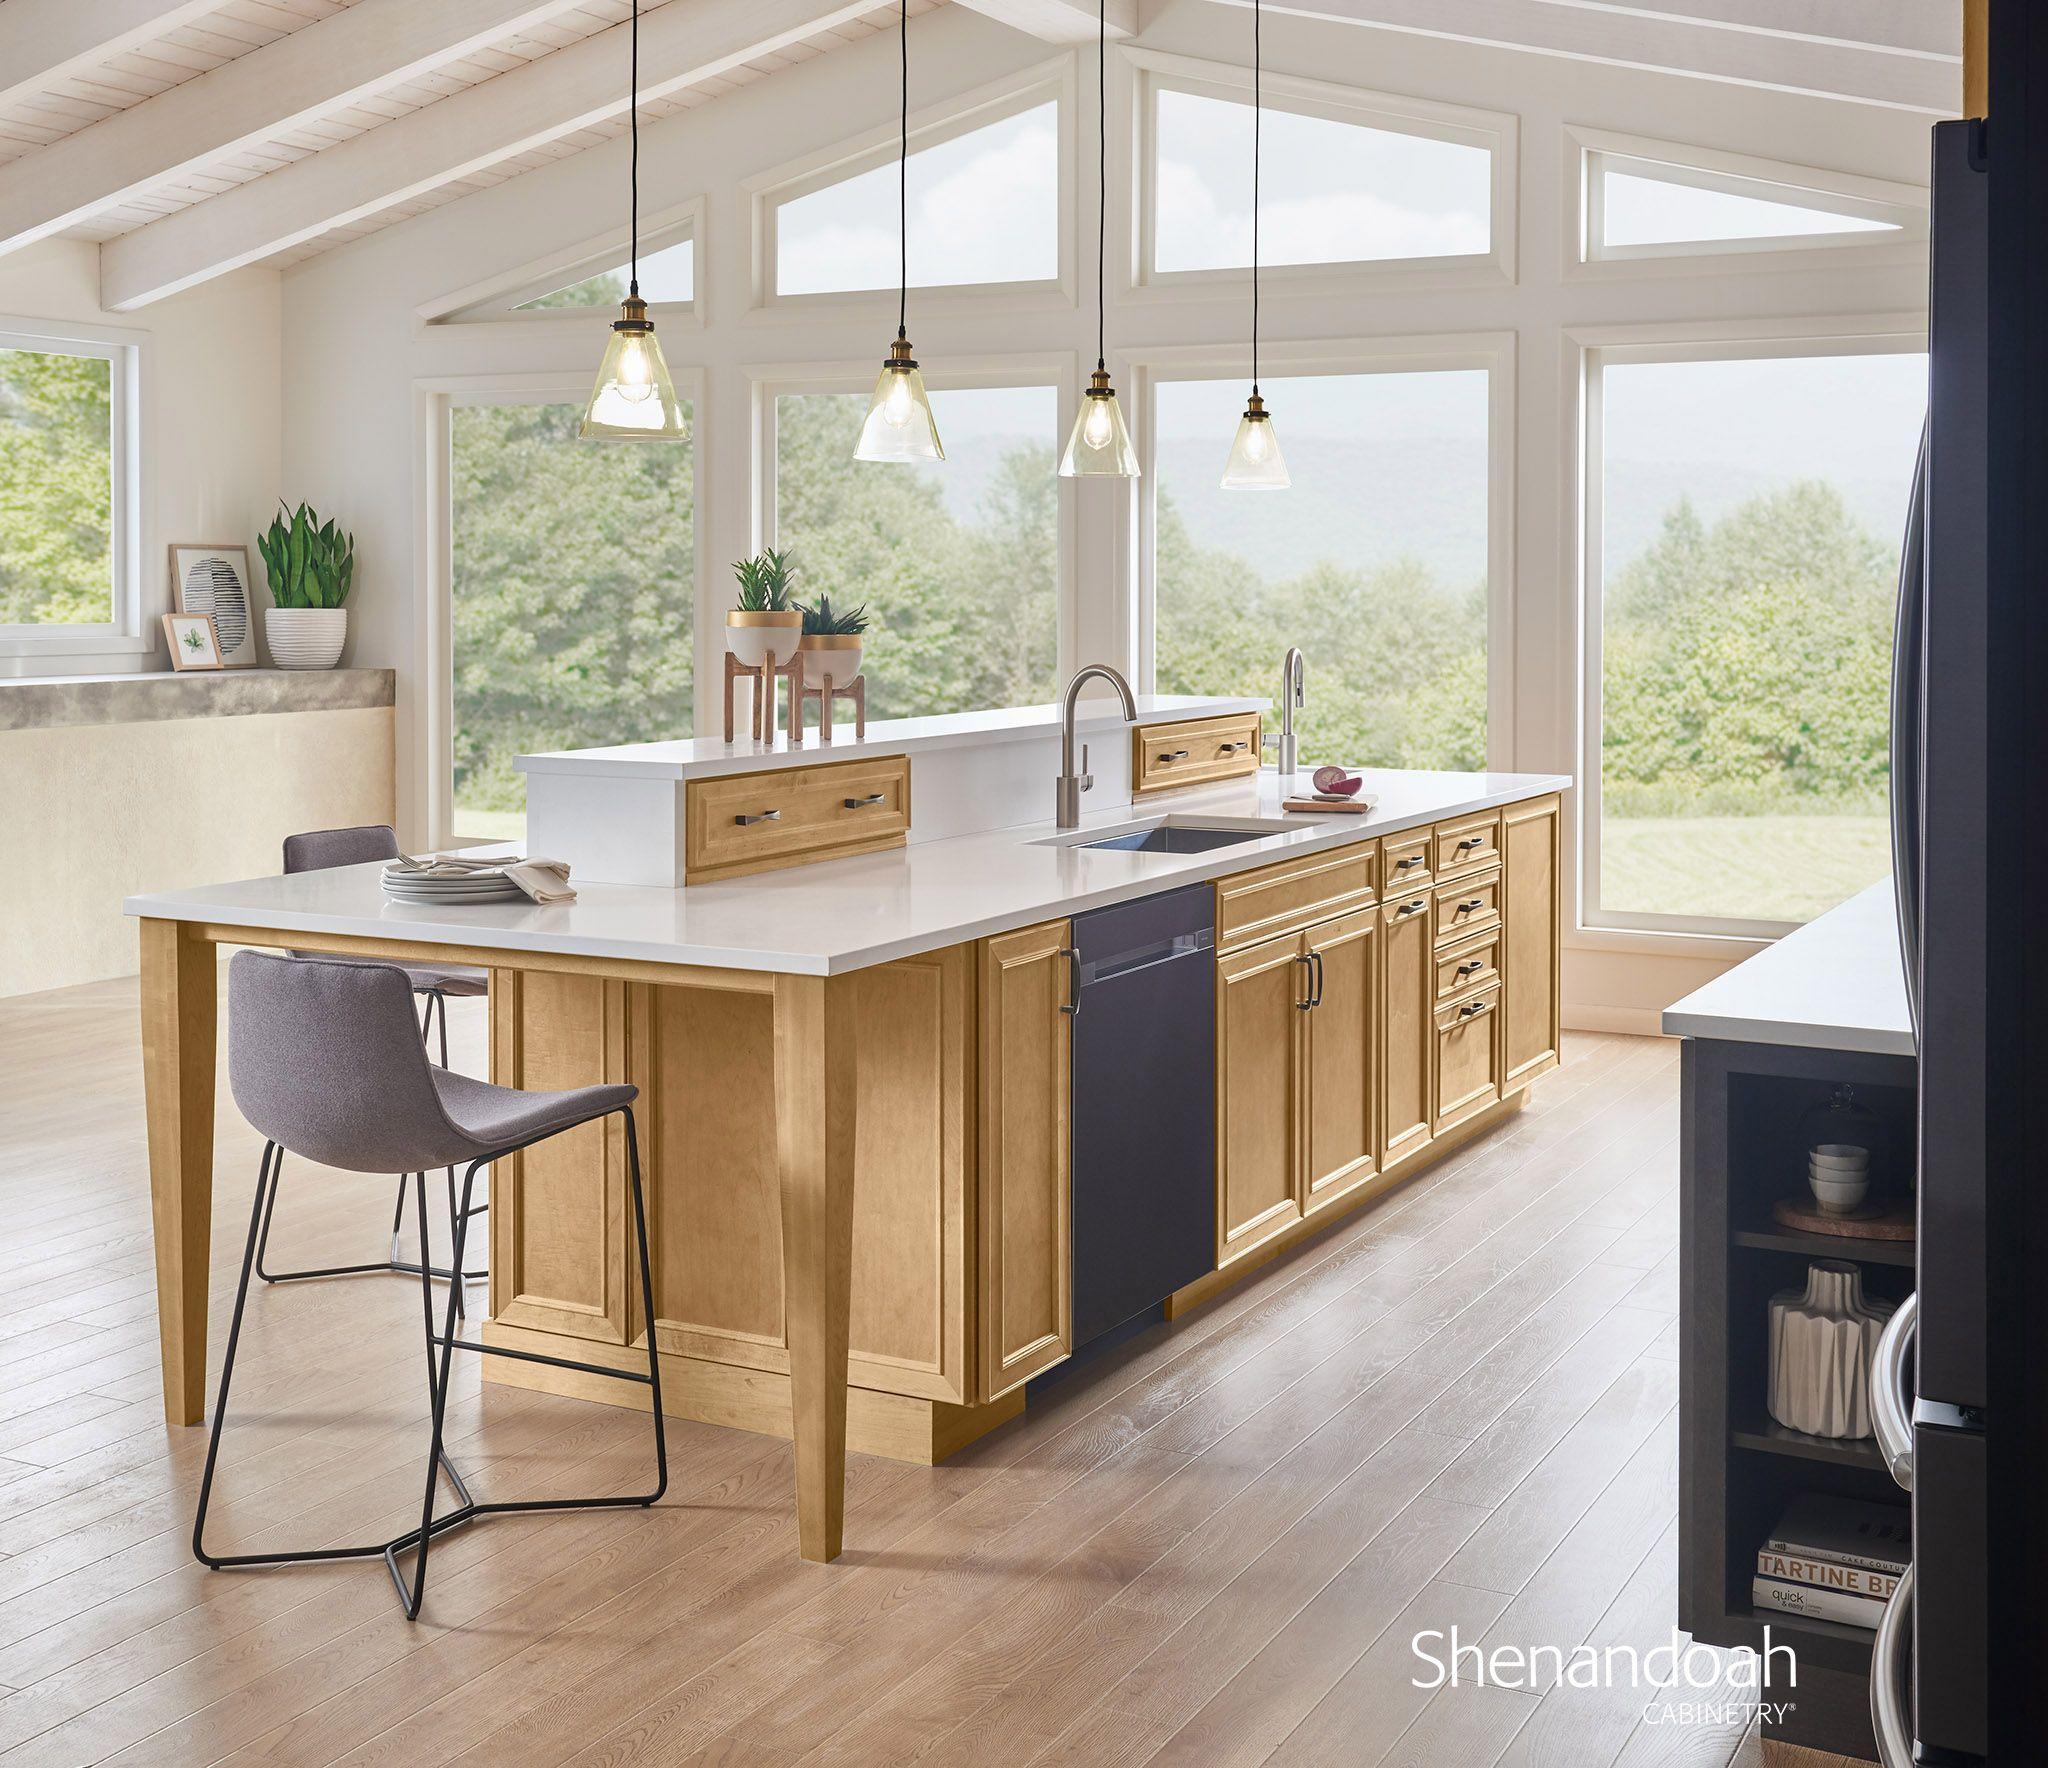 Pin by Shenandoah on Kitchen Islands Quality